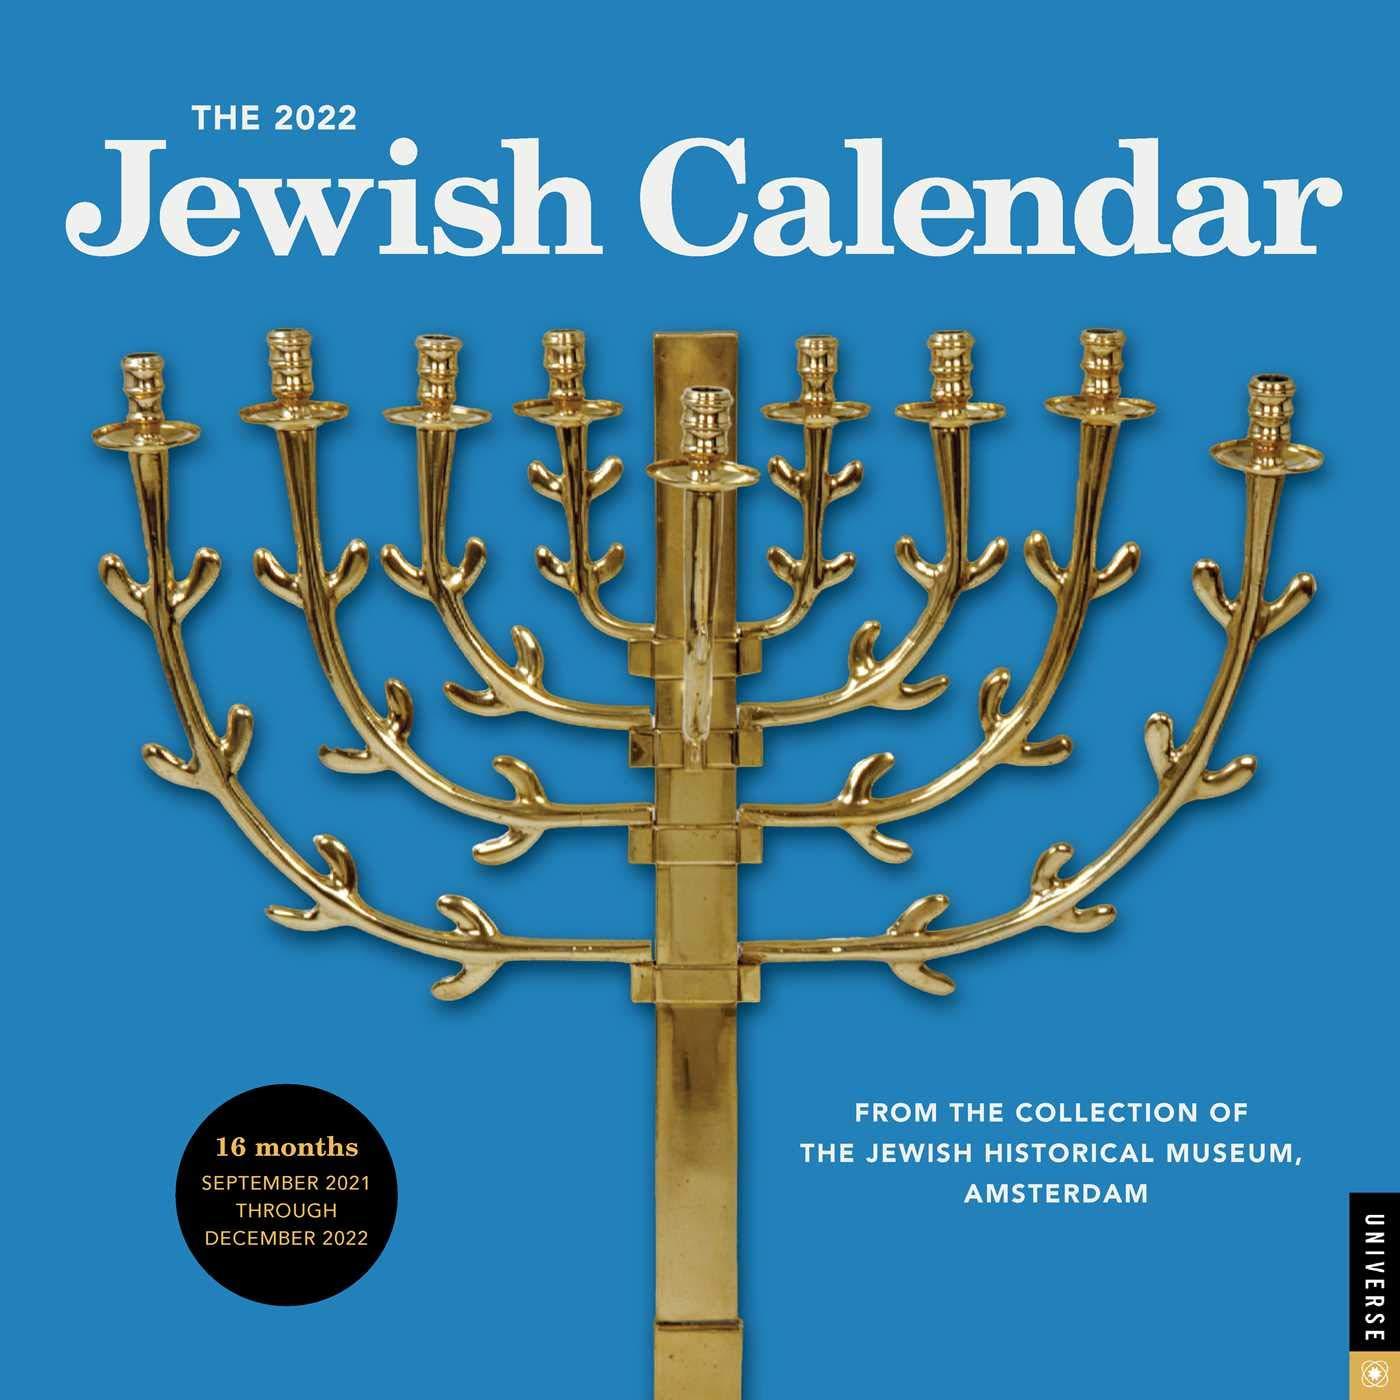 Biblical Calendar 2022.The 2022 Jewish Calendar 16 Month 2021 2022 Wall Calendar Jewish Year 5782 Jewish Historical Museum Amsterdam 0676728040422 Amazon Com Books